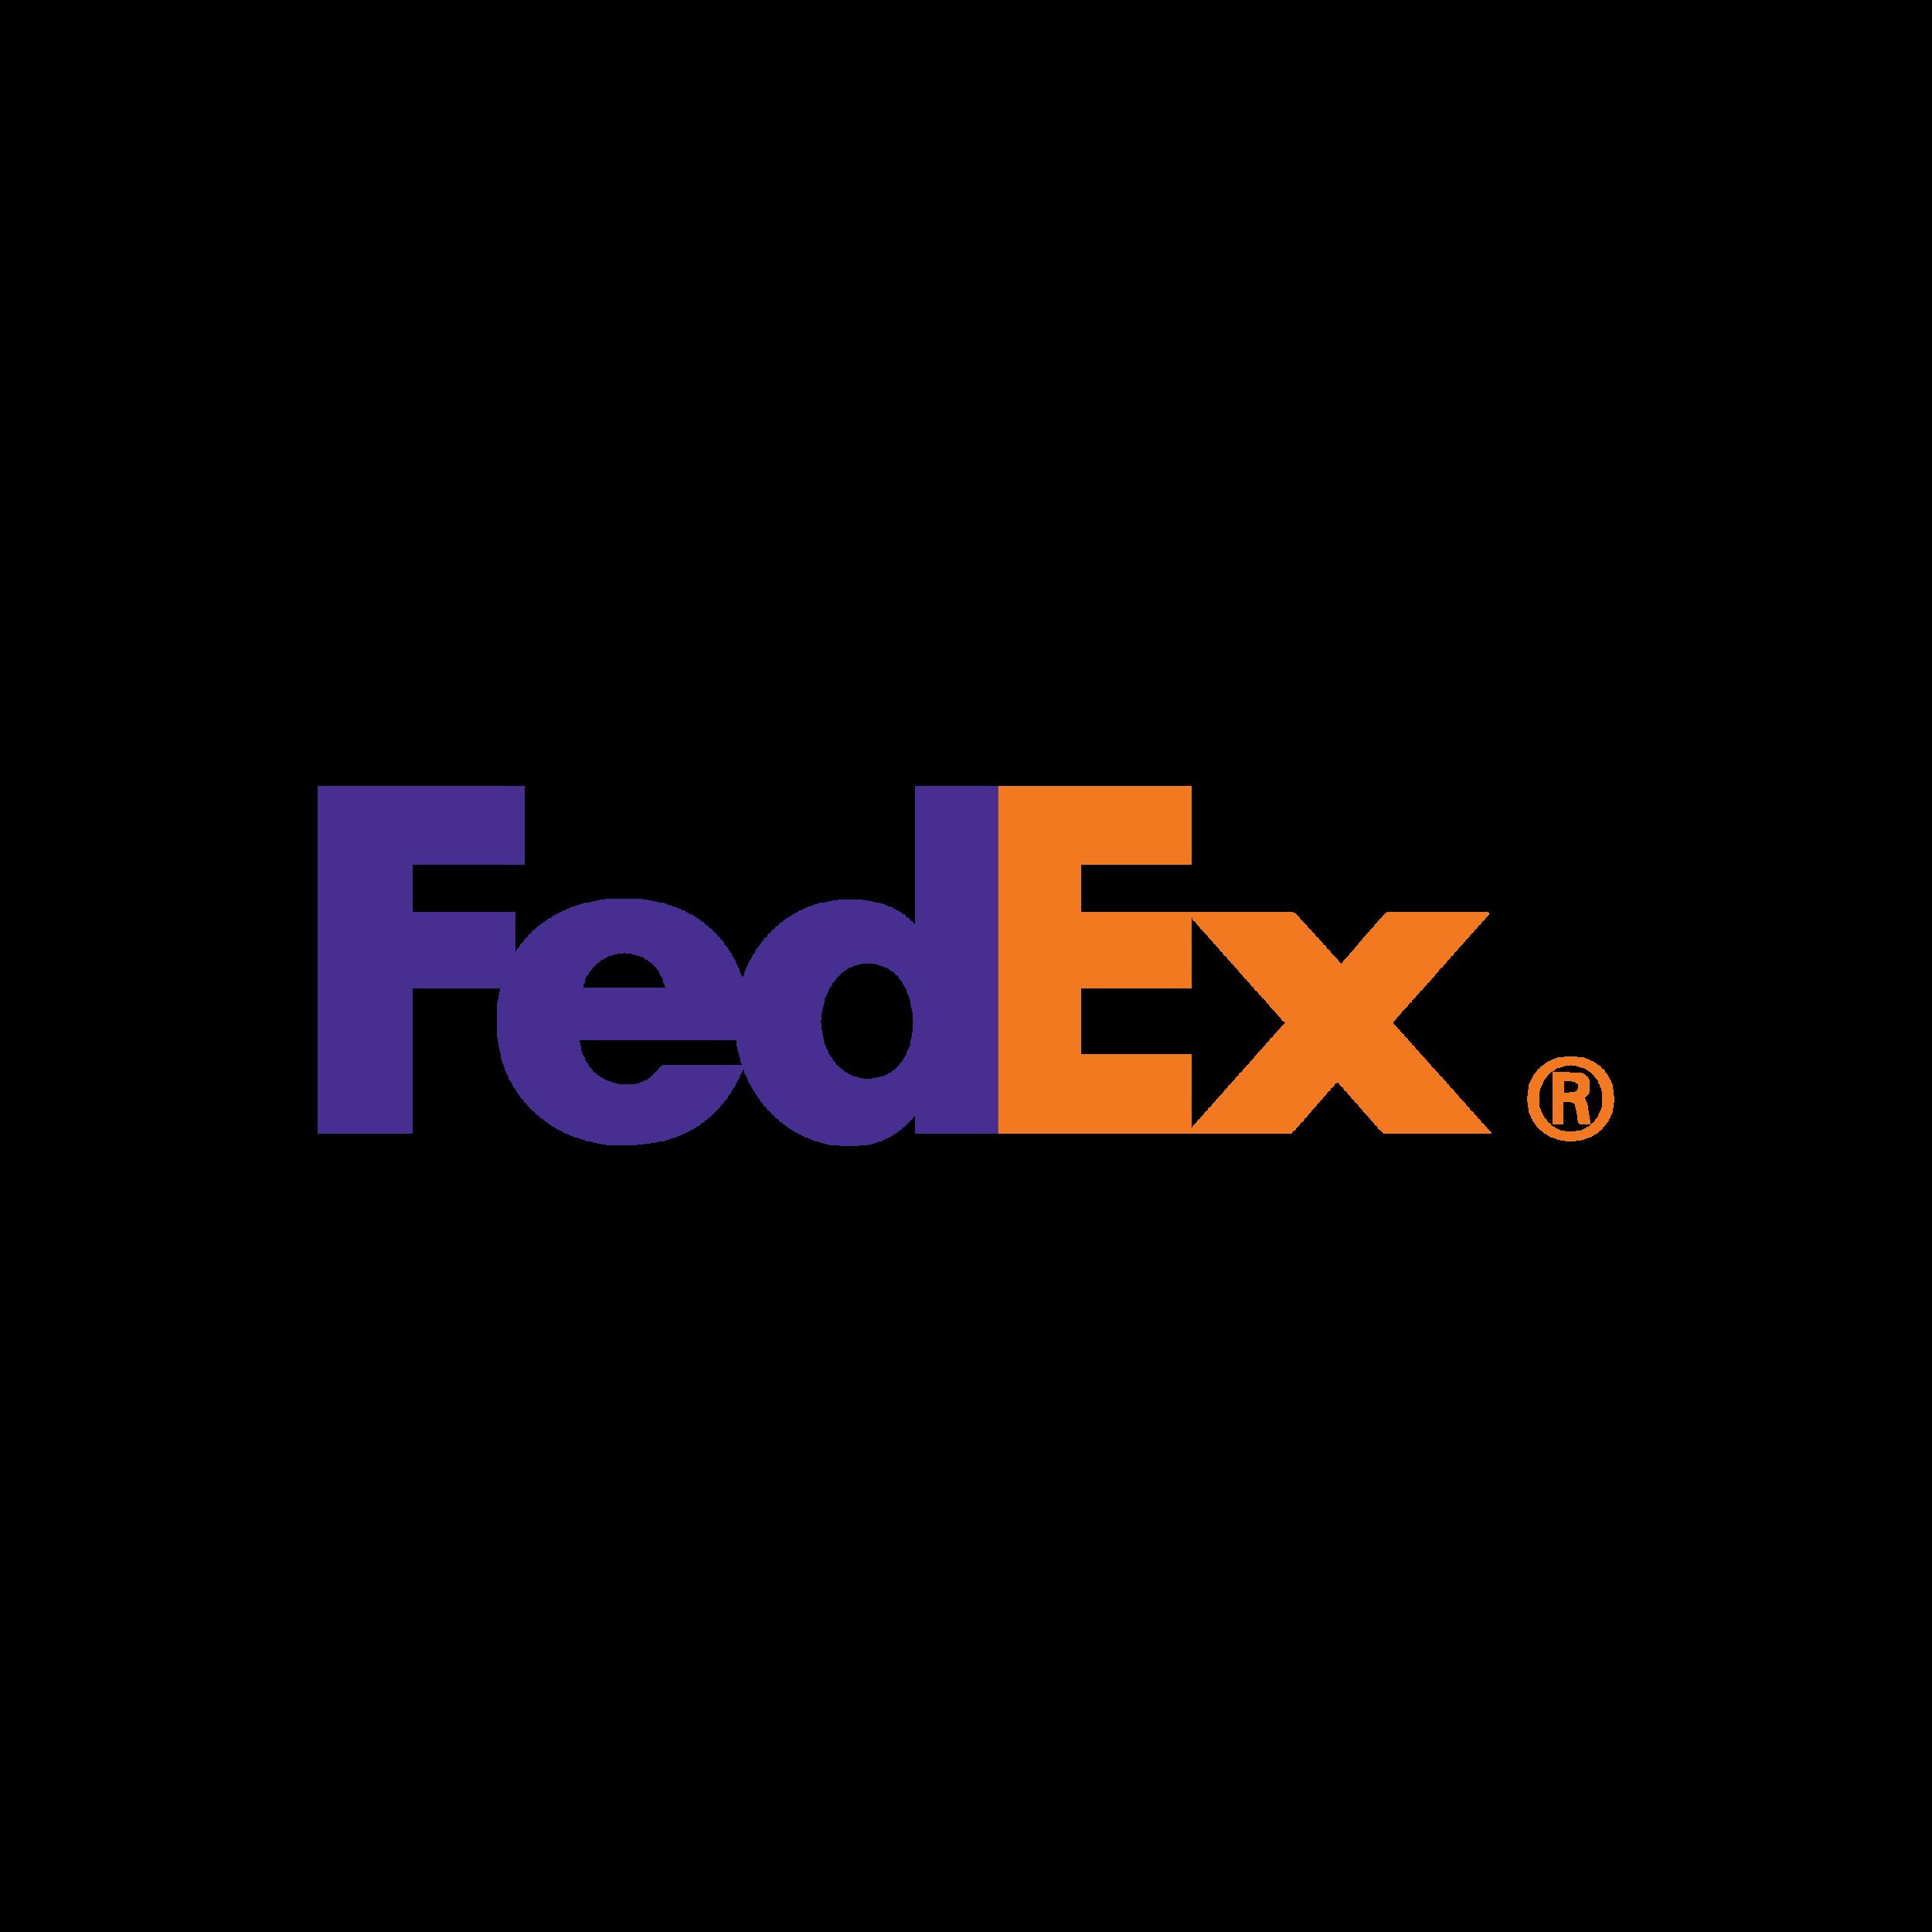 FedEx-01.png